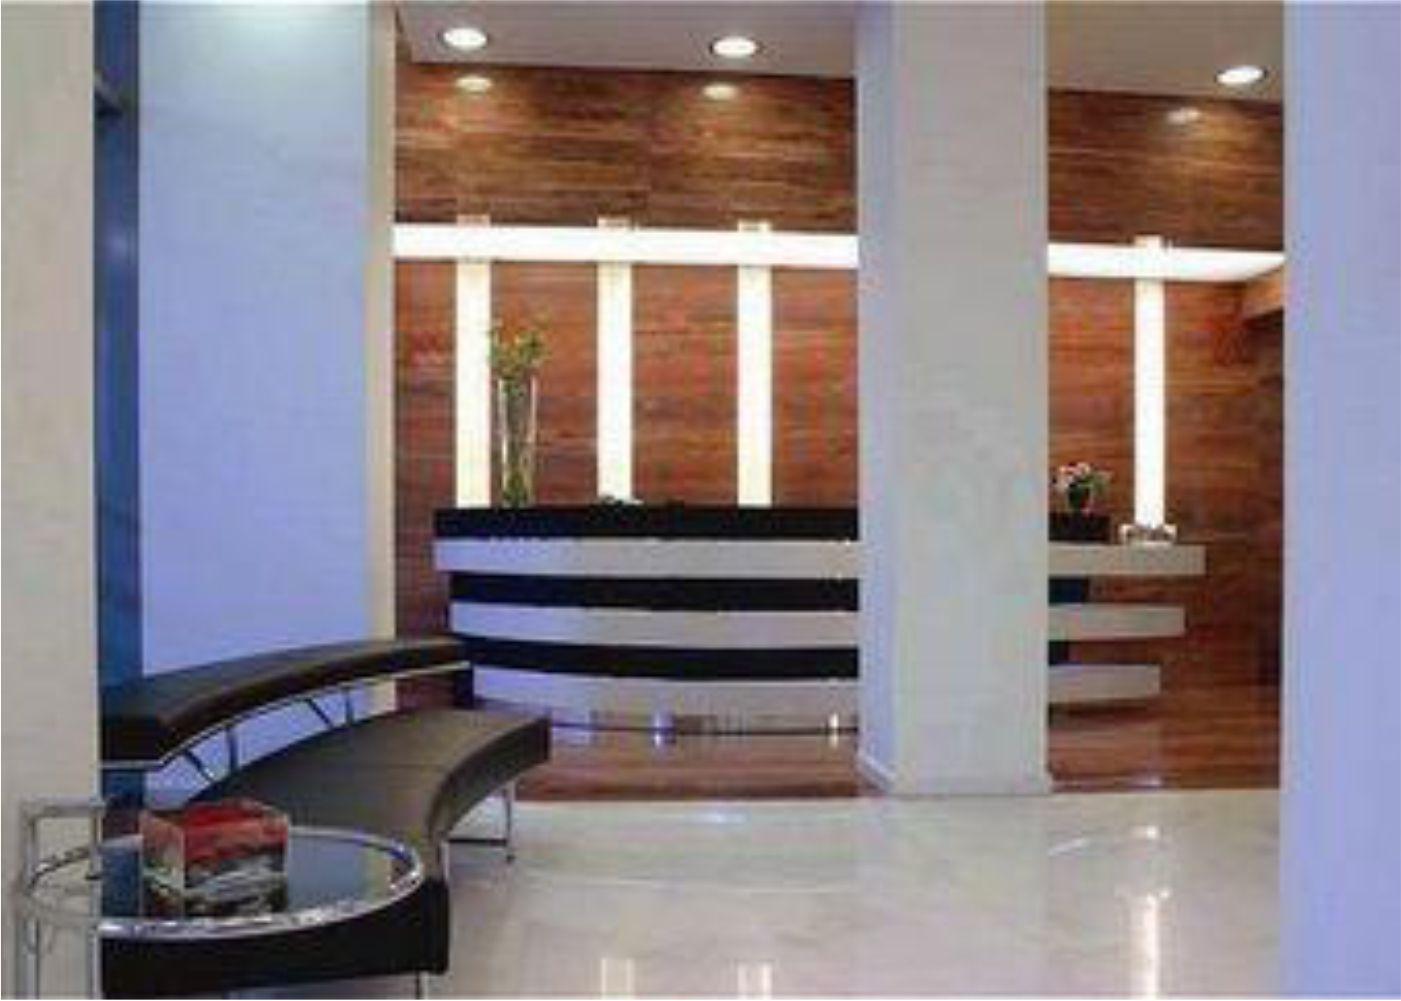 paraskevi-interior-kaningos-21-hotel-8